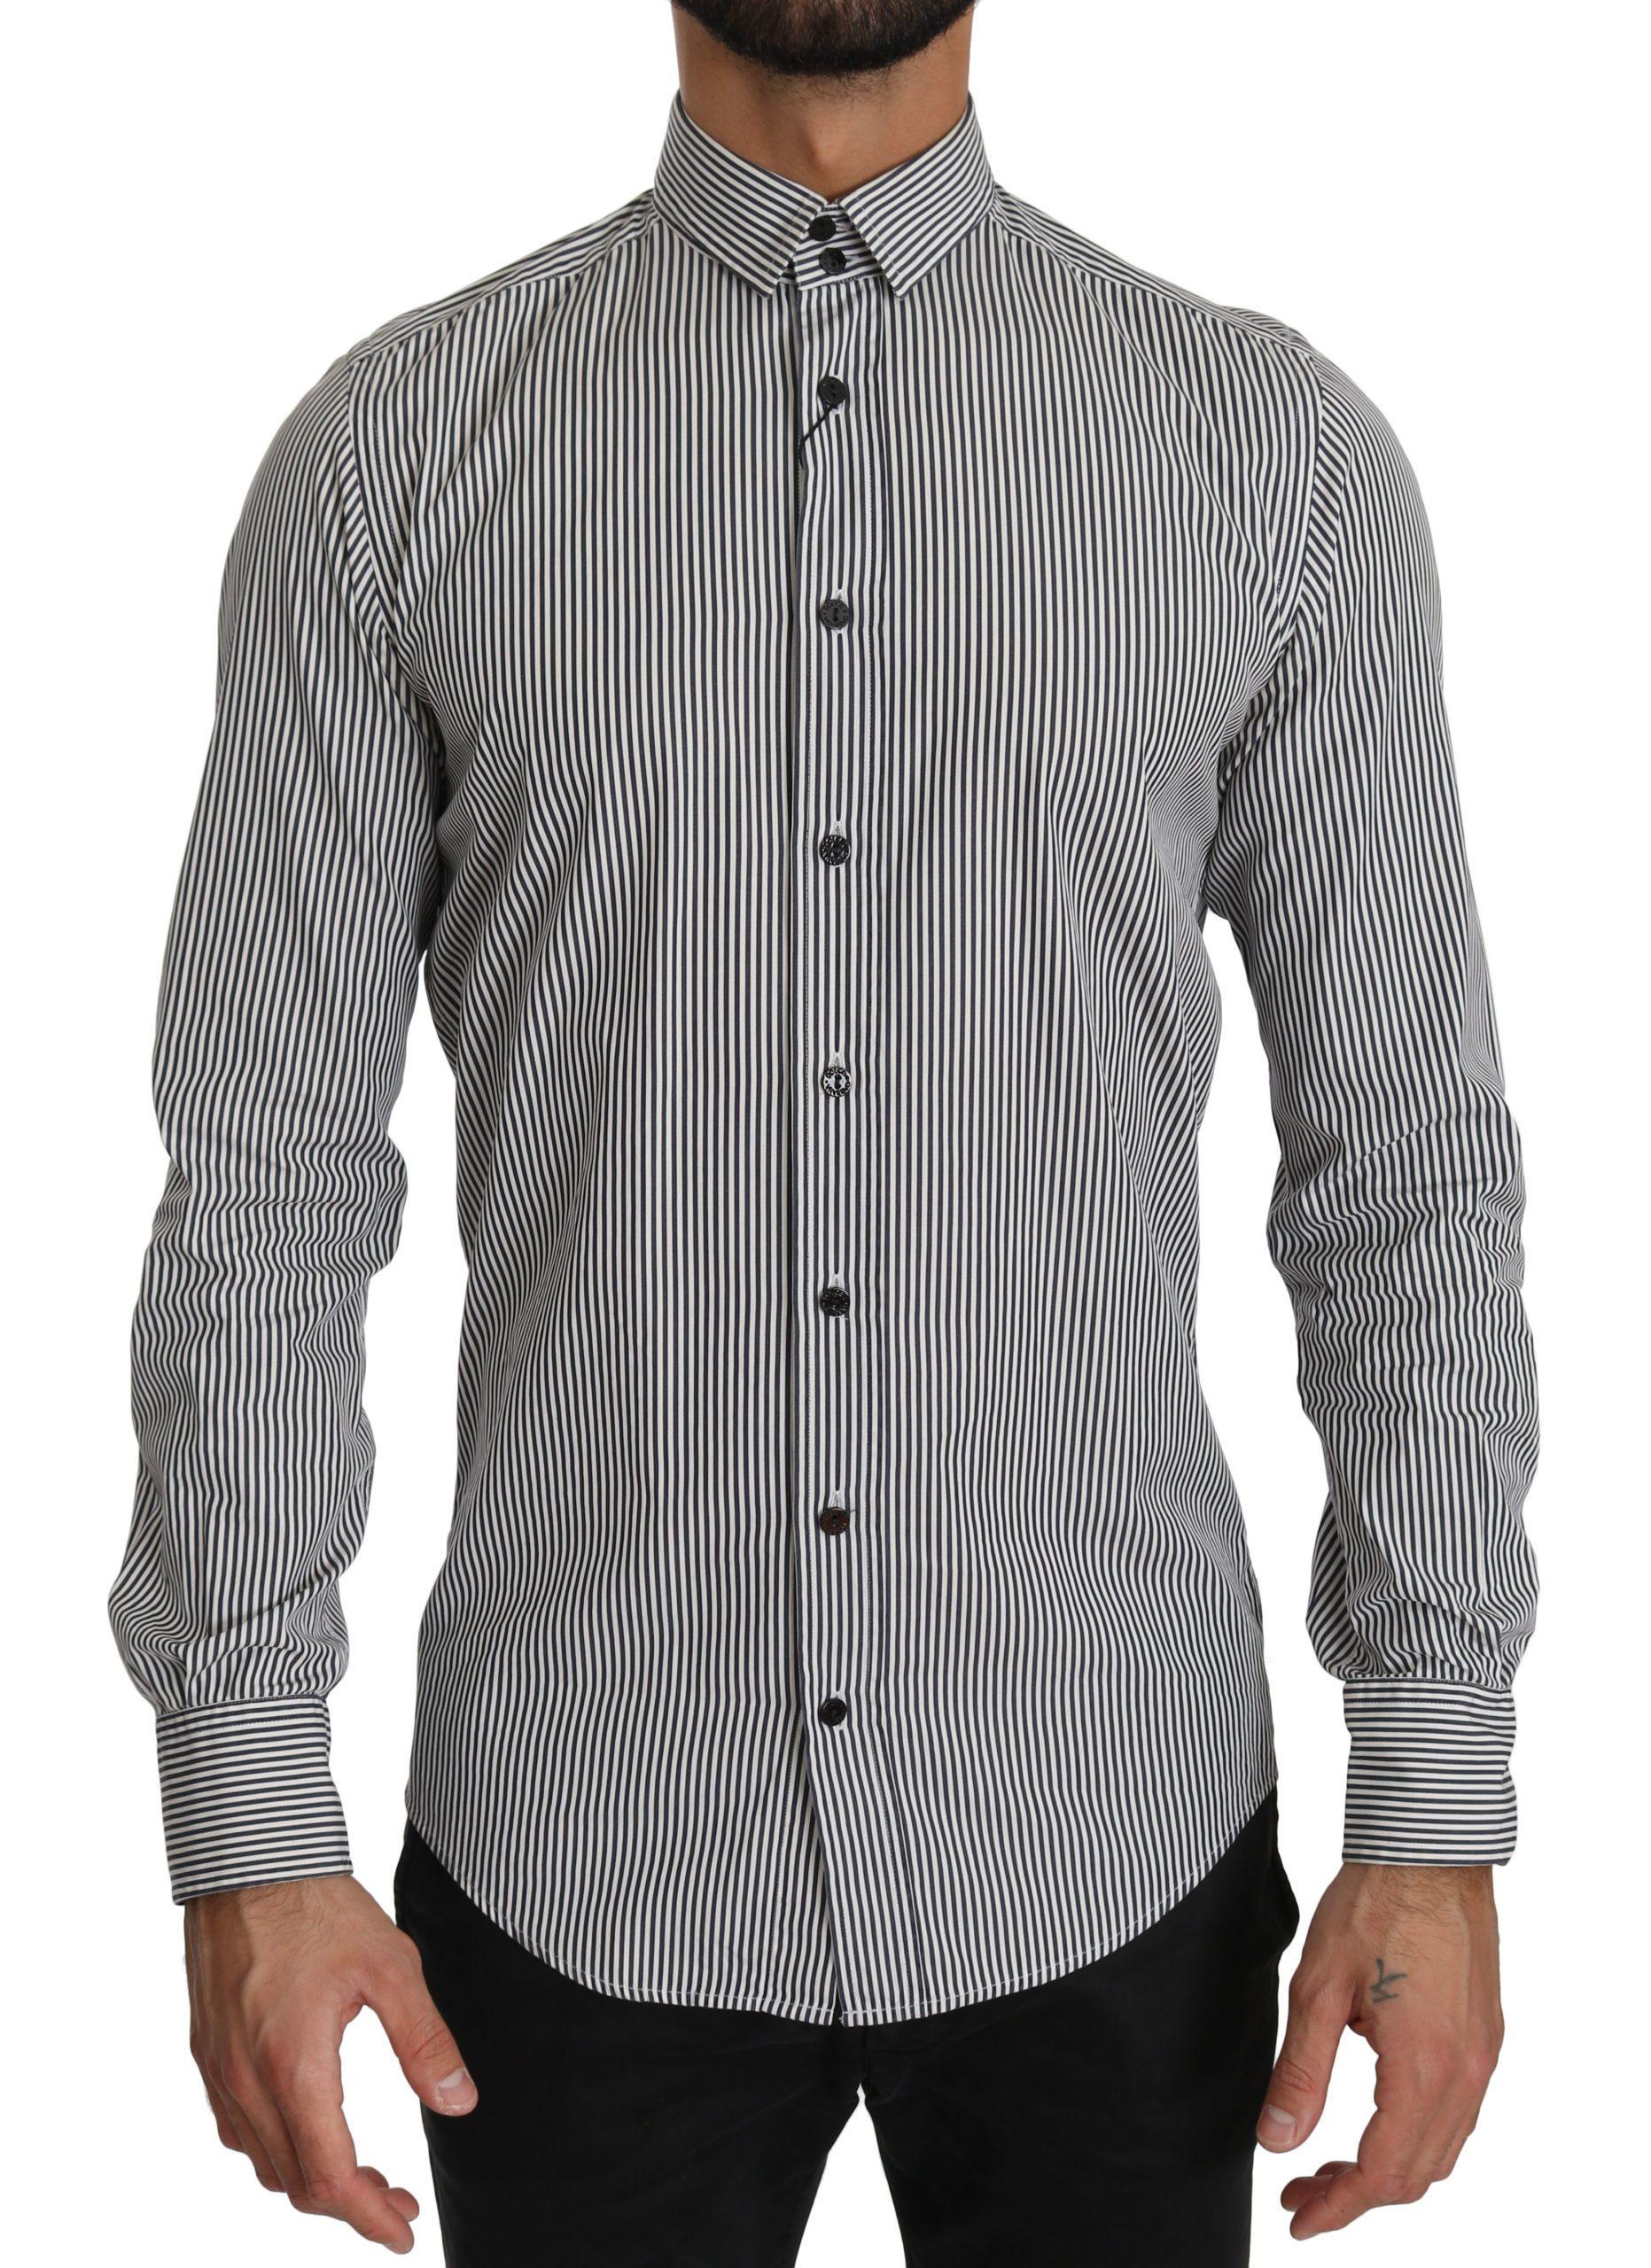 Dolce & Gabbana Men's Stripes Formal Shirt Black TSH4024 - IT39   S